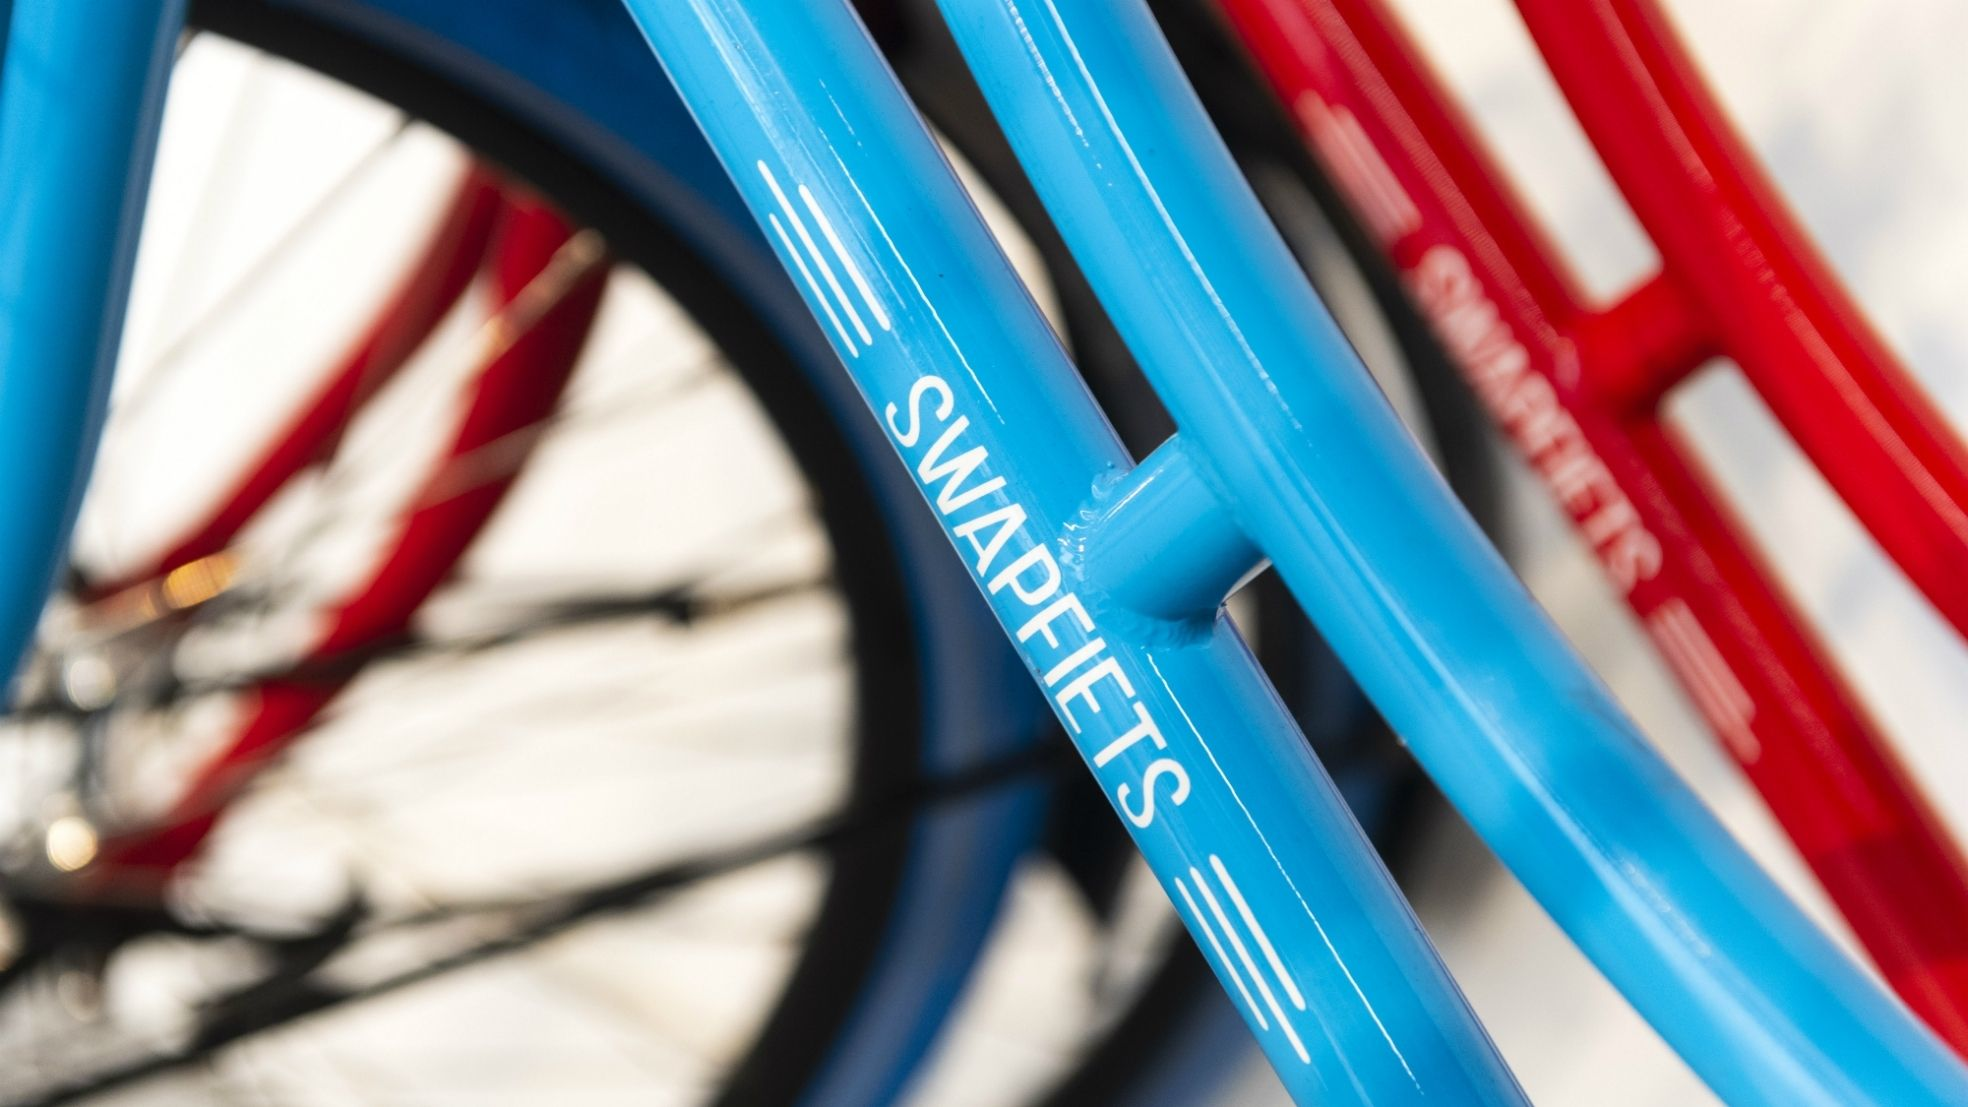 Swapfiets logo frame